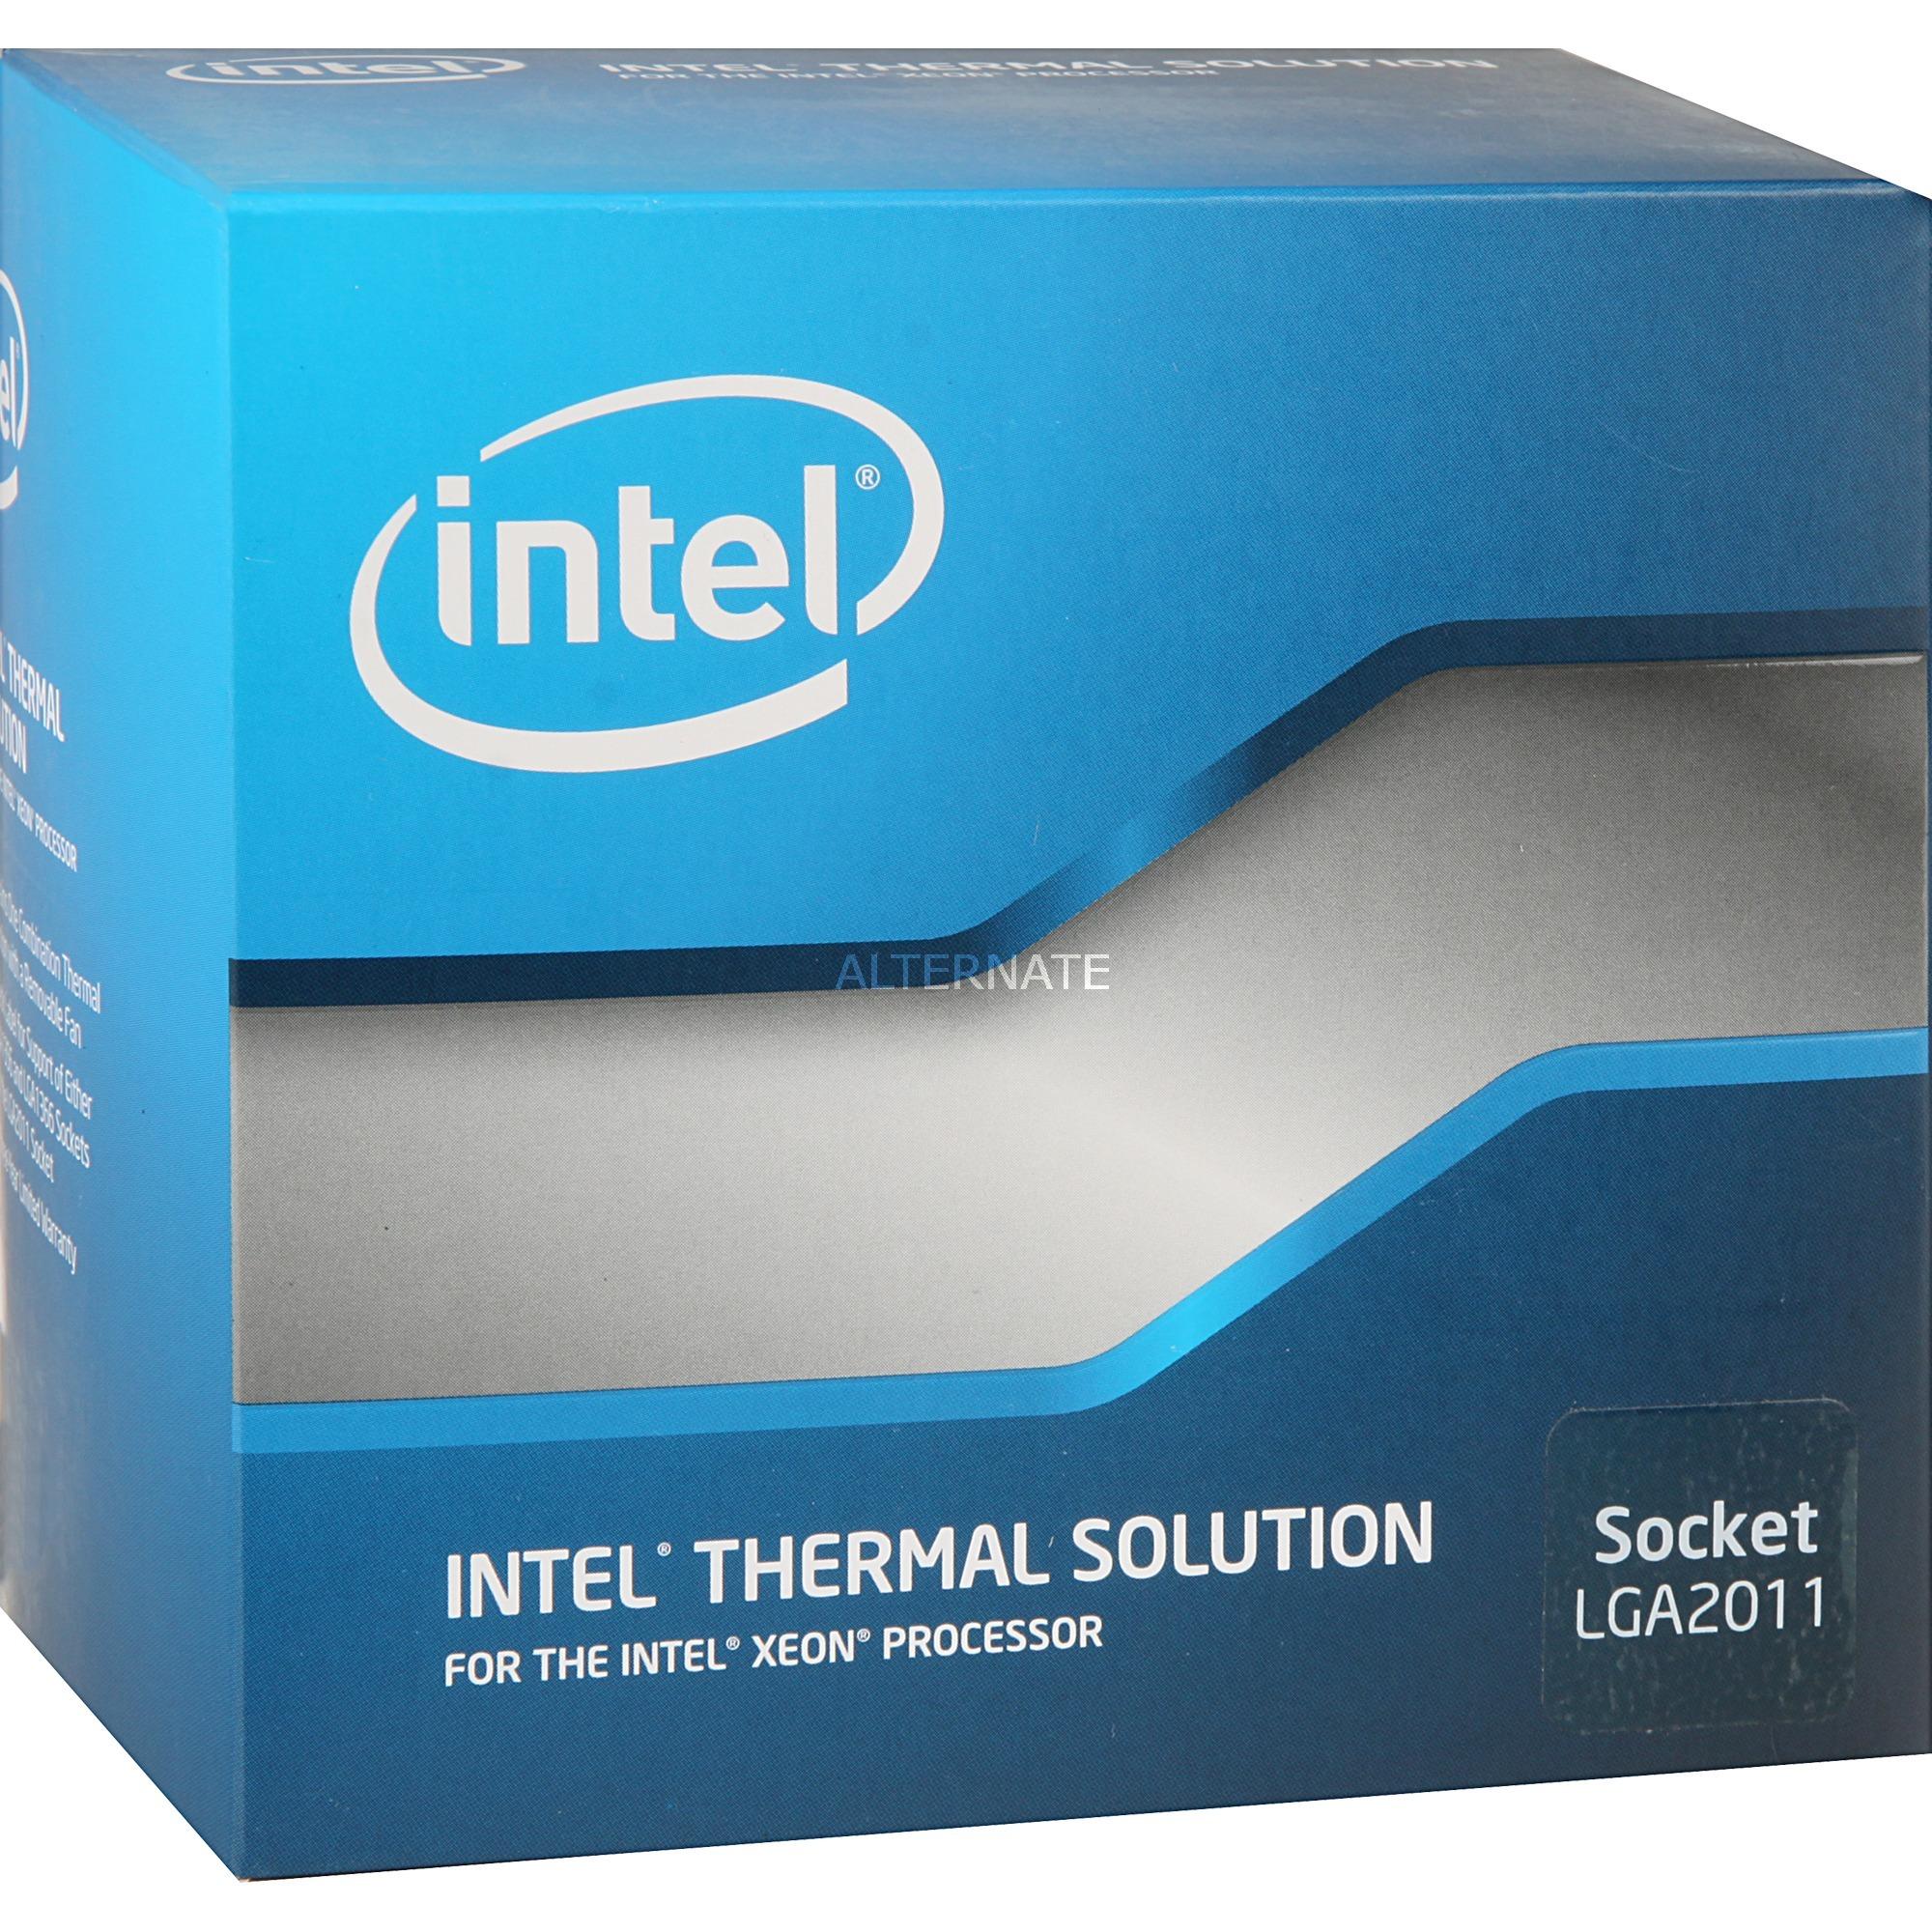 thermal-solution-bxsts200c-cpu-koler